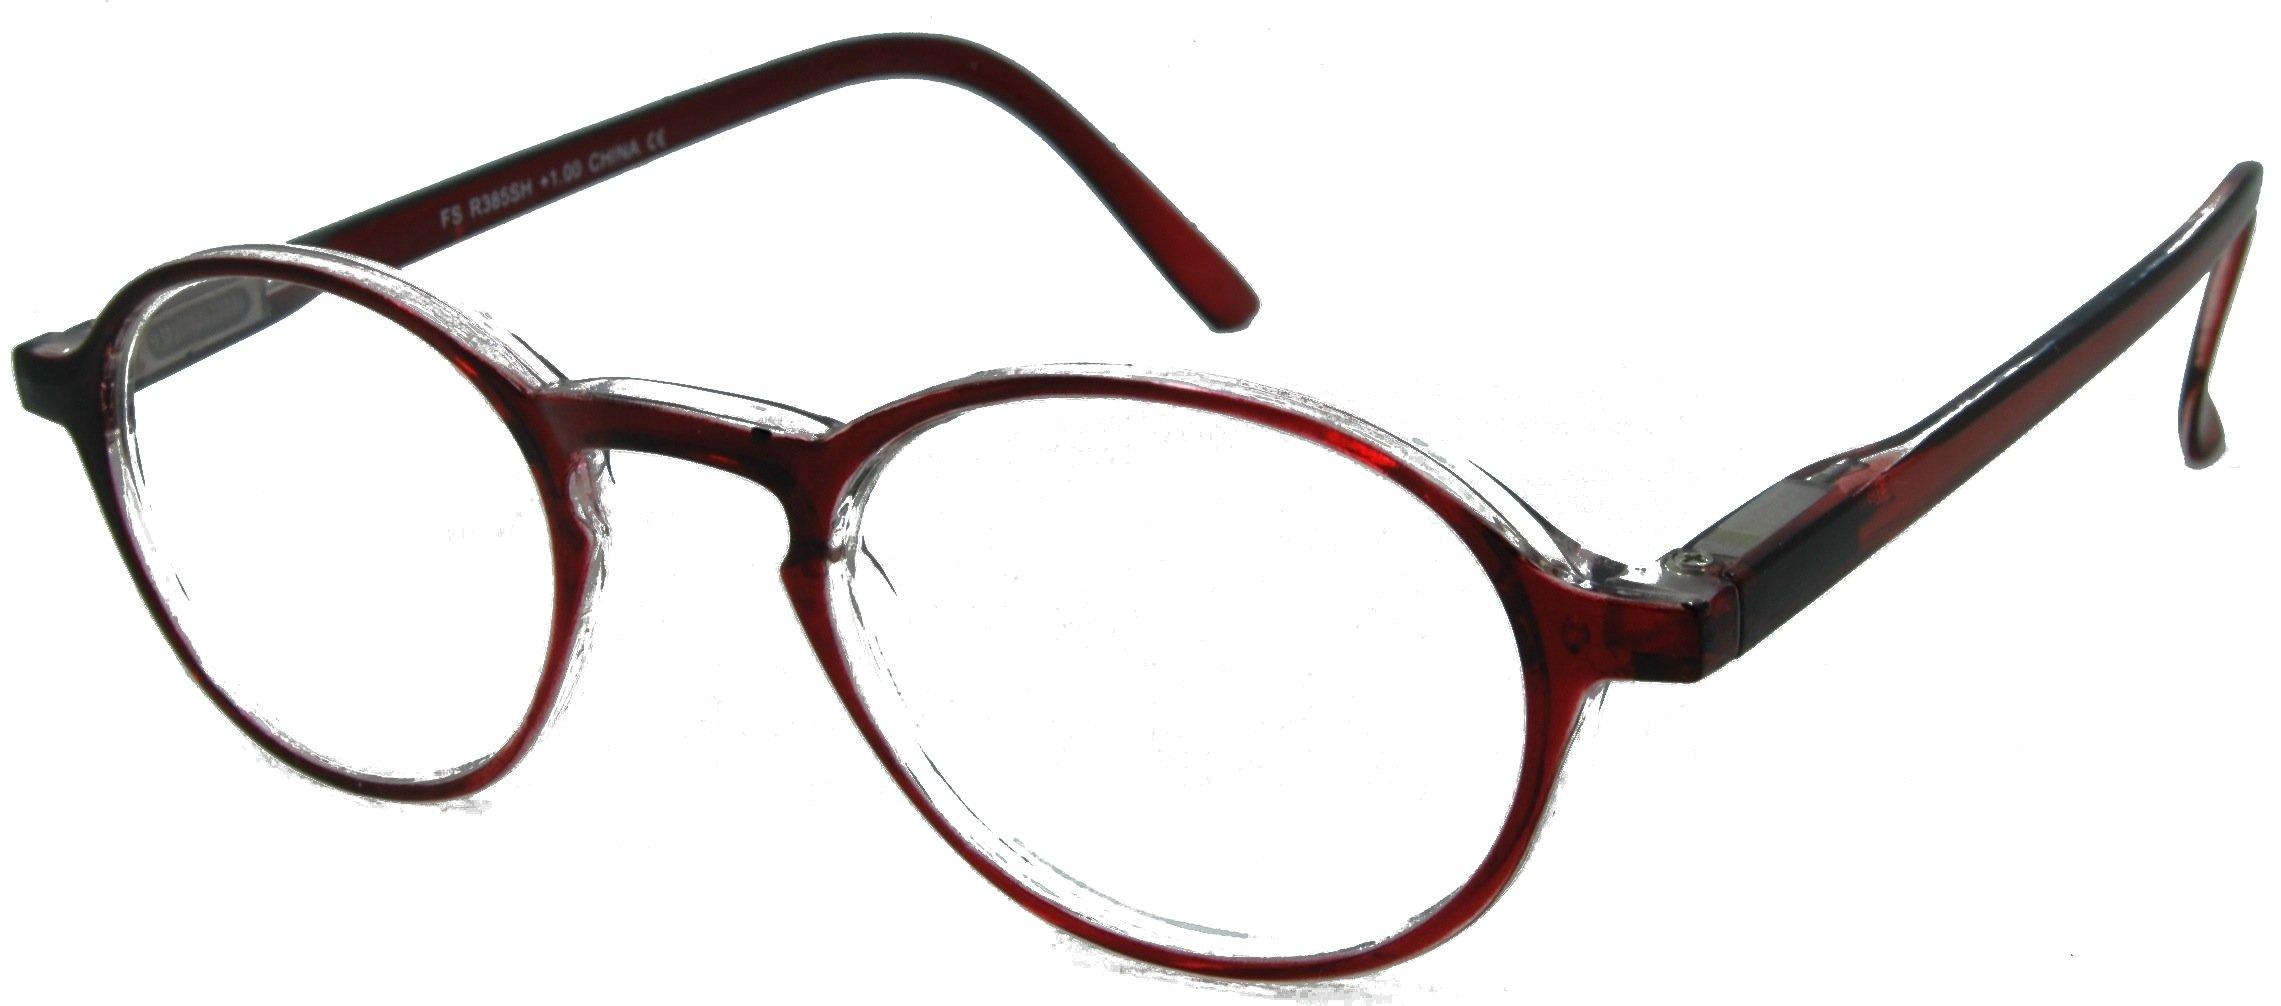 Sublime Superior Stylish Reading Glasses burgundy 2.00 by In Style Eyes